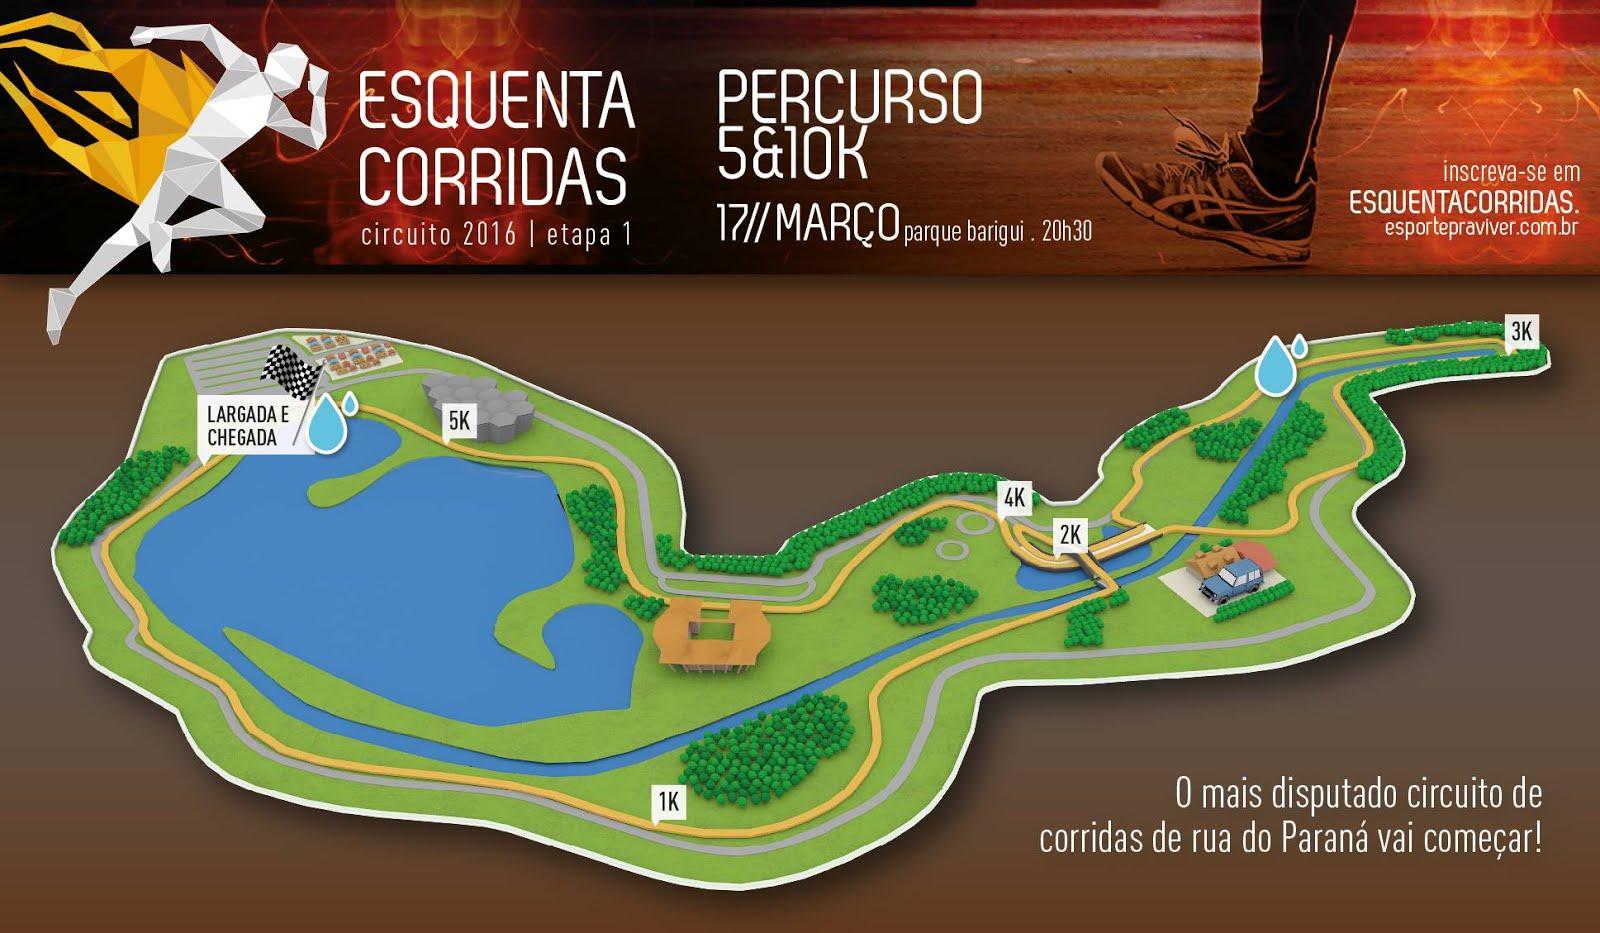 2f7fd9408 Esquenta de Corridas SUBWAY® – Etapa 1 – Pq. Barigui